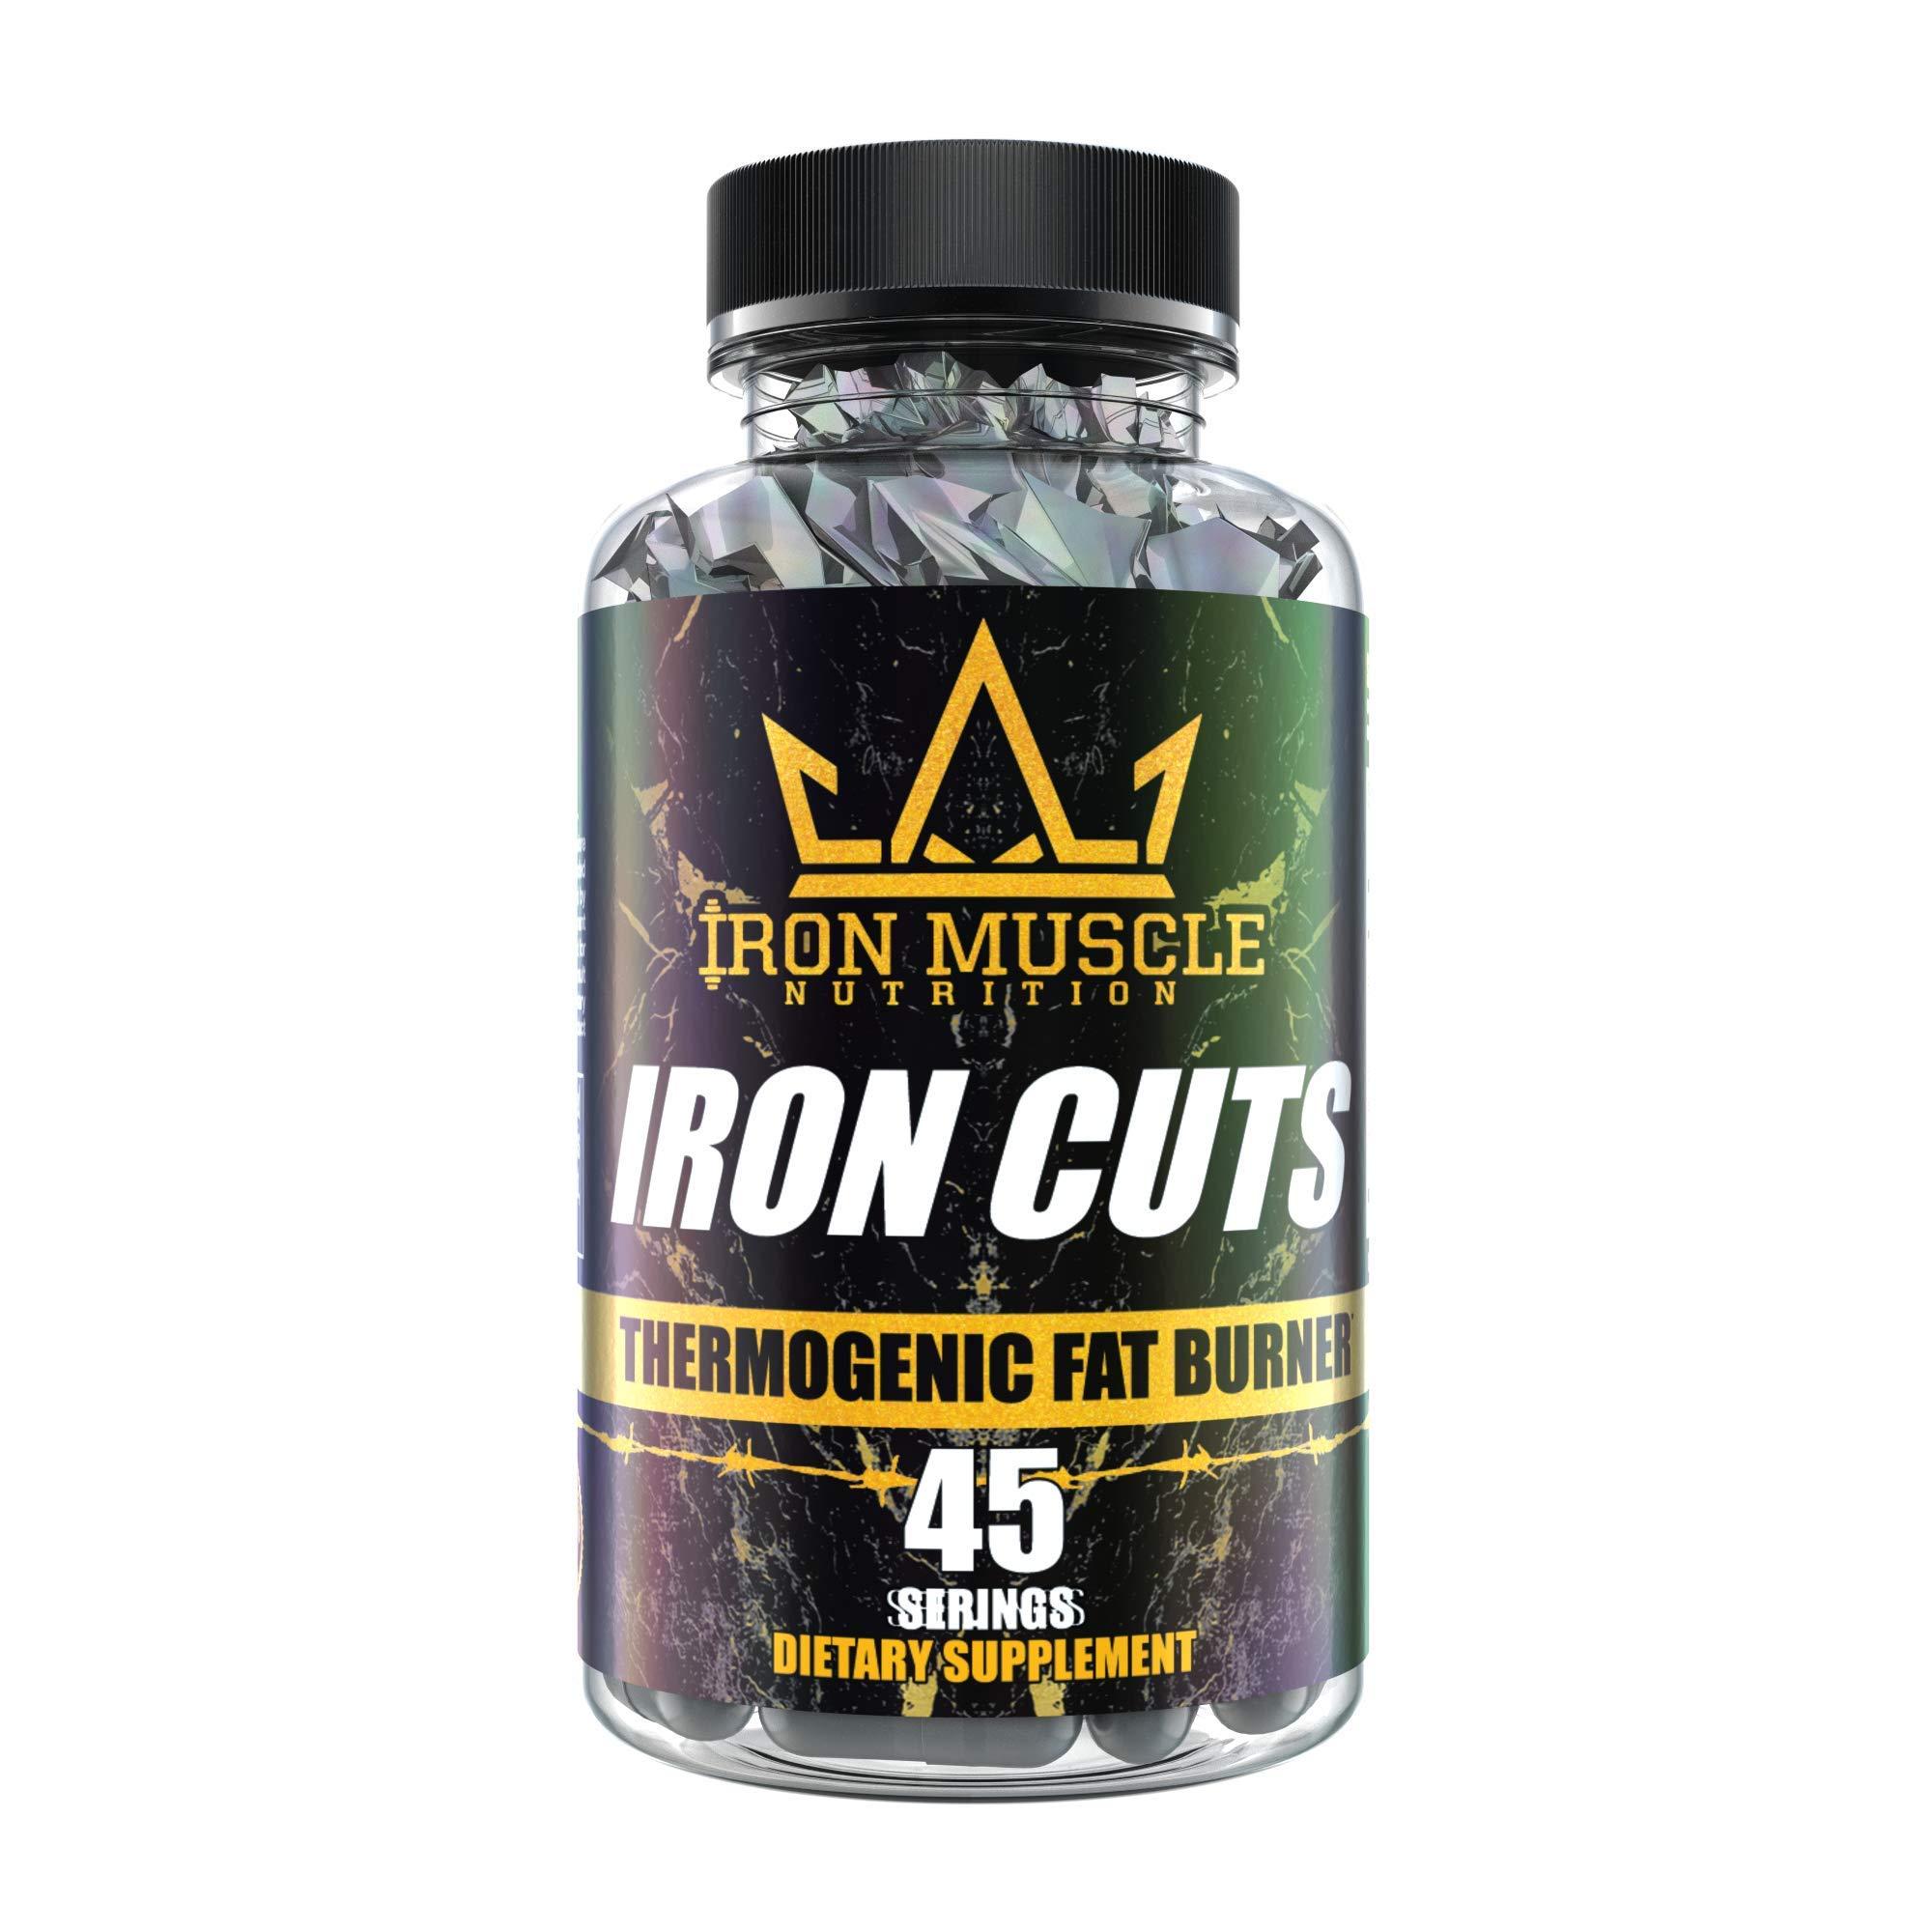 Iron Muscle Iron Cuts Fat Burner by IRON MUSCLE